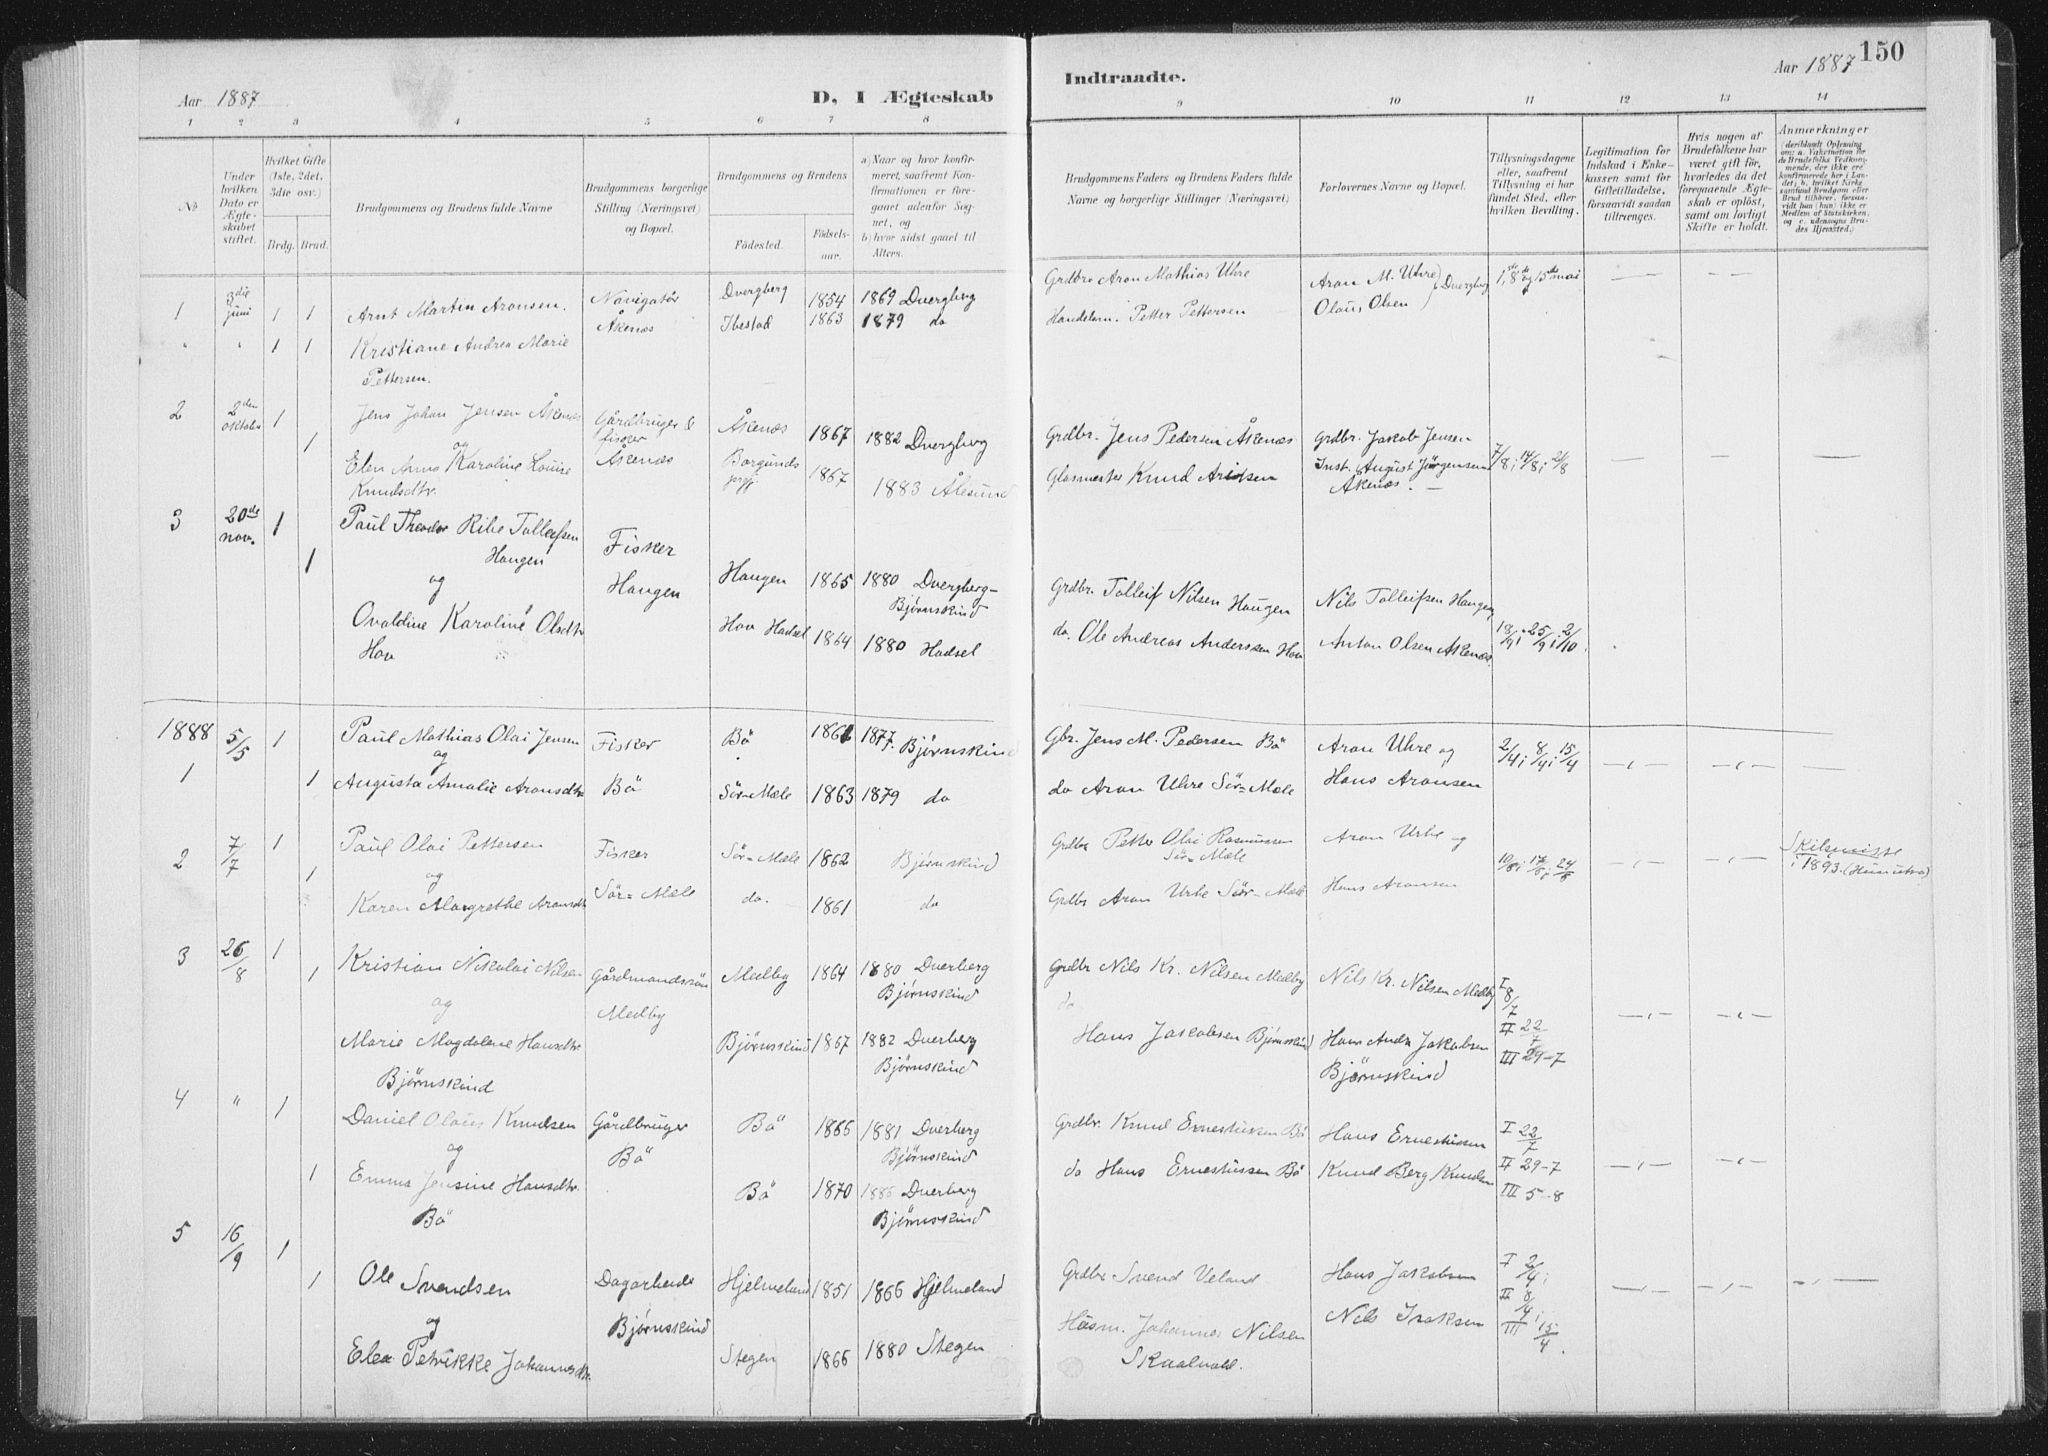 SAT, Ministerialprotokoller, klokkerbøker og fødselsregistre - Nordland, 898/L1422: Ministerialbok nr. 898A02, 1887-1908, s. 150